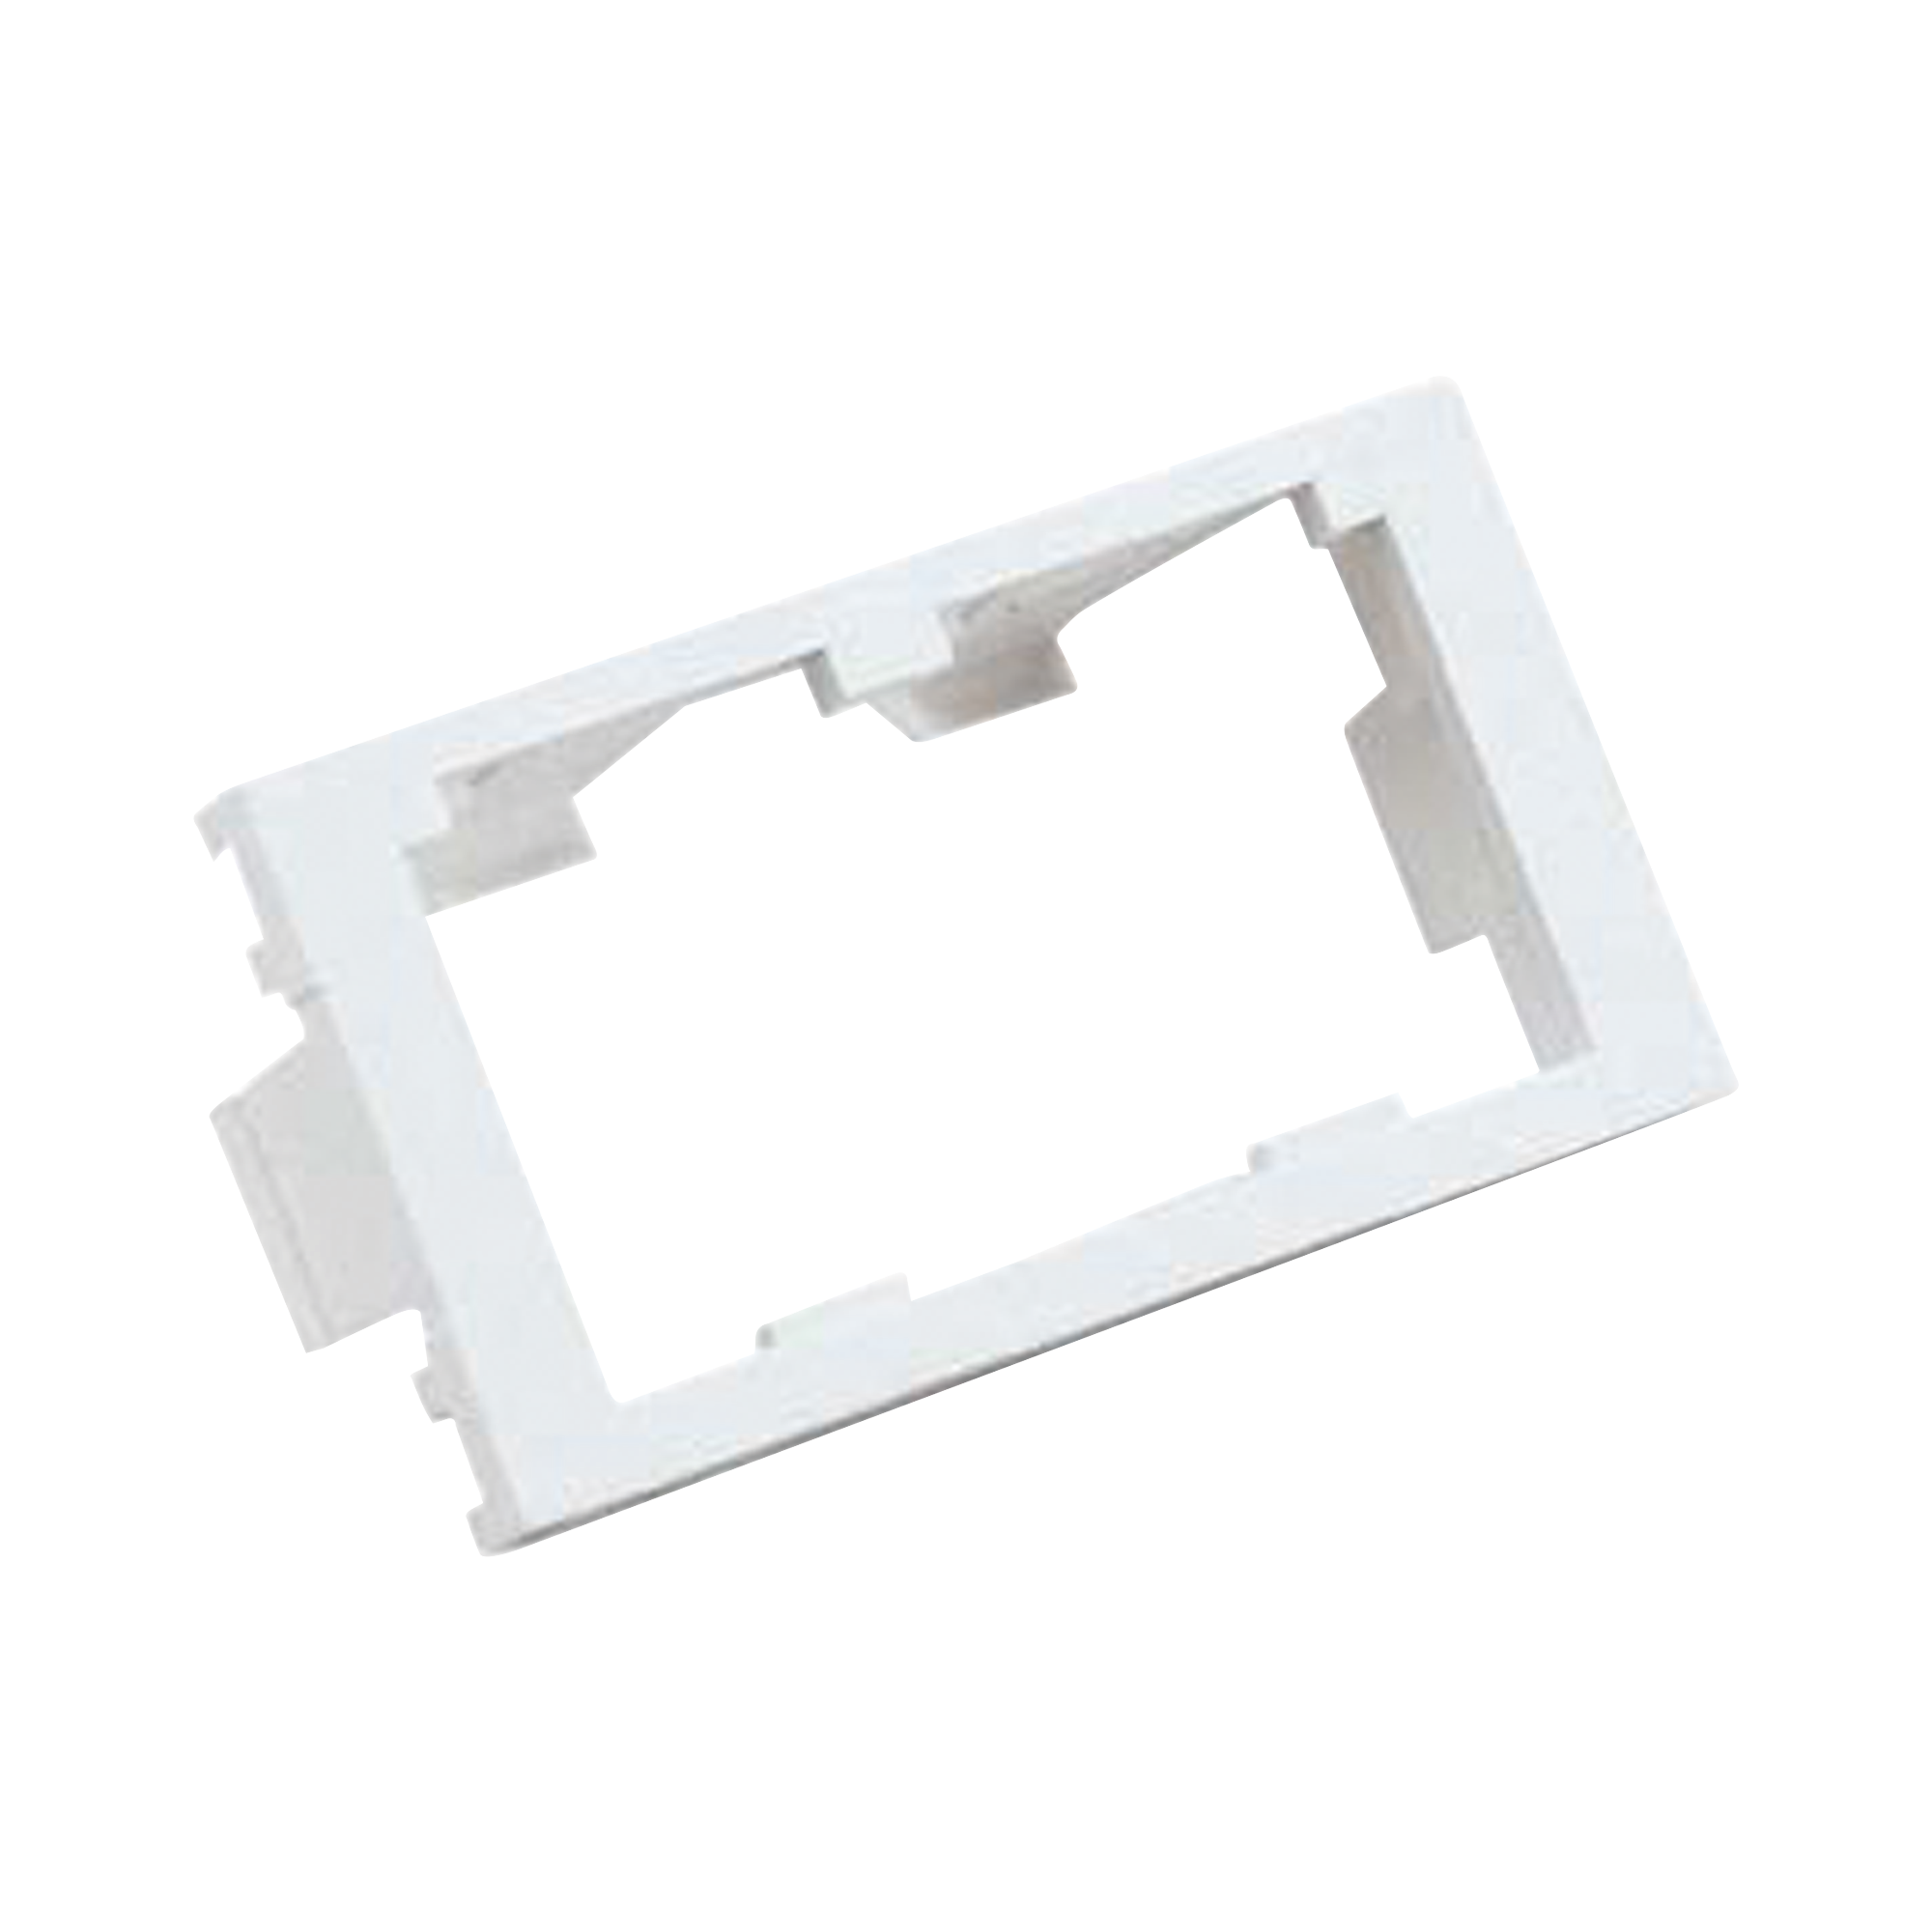 Inserto Plano de 1/3, Espacio para Dos Módulos Mini-Com?, Color Blanco Mate